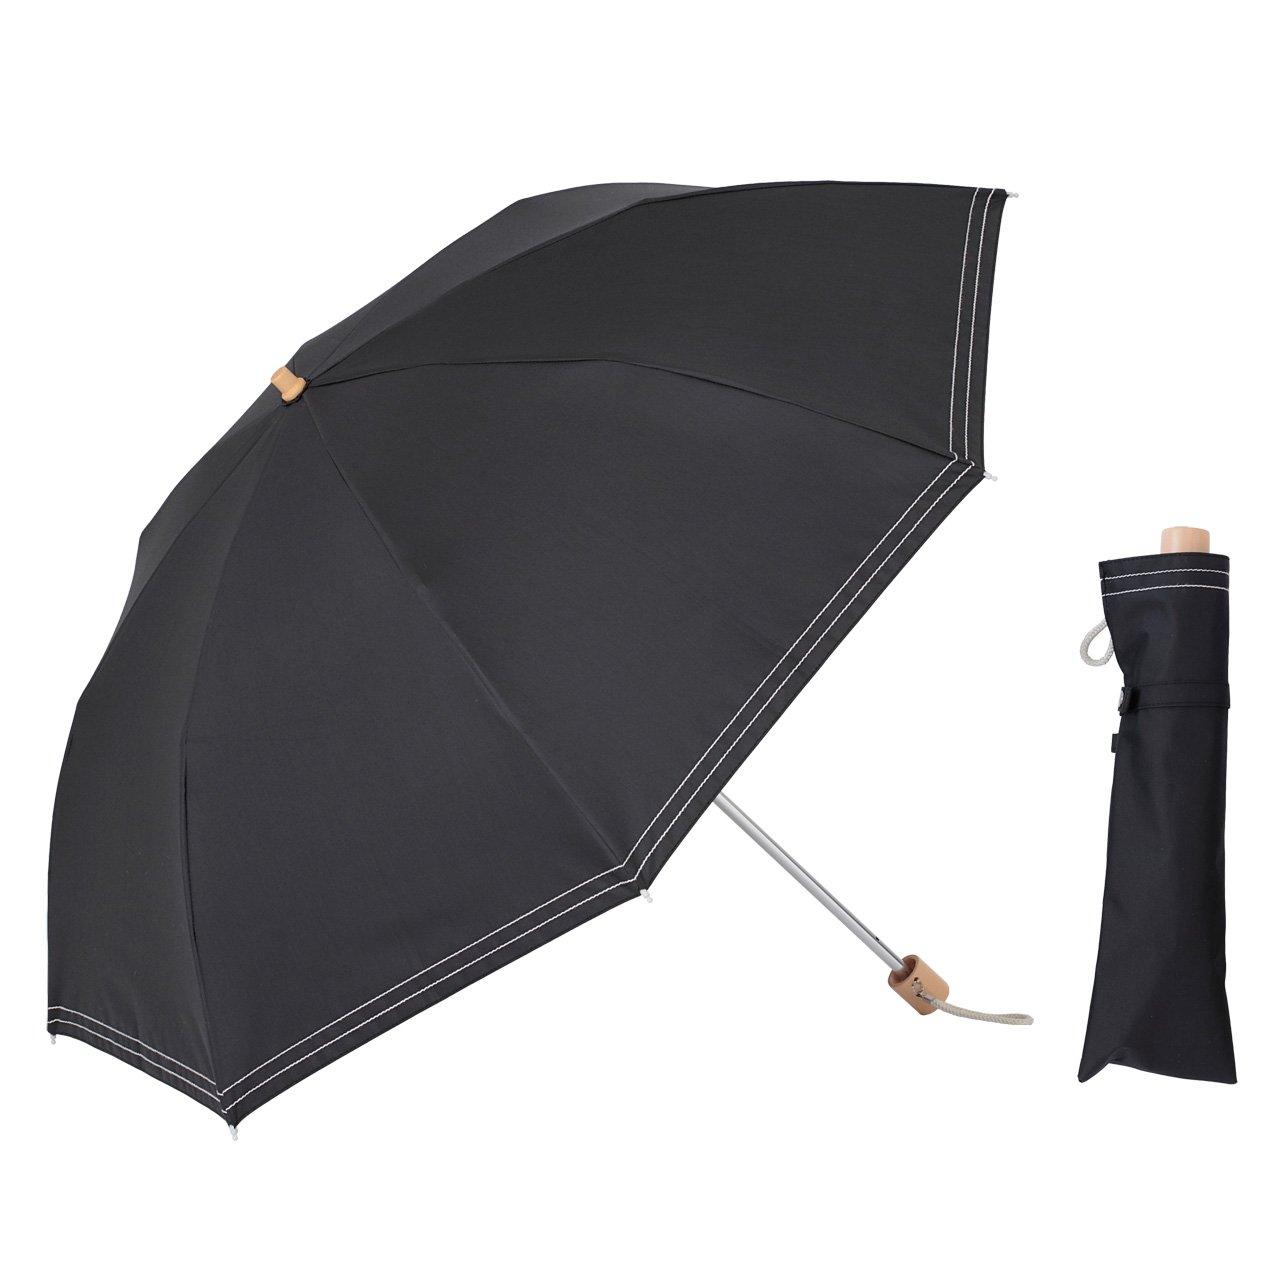 UVカット 遮光折傘 クールプラス ステッチ 晴雨兼用 50cm 日傘 ラミネート生地【LIEBEN-0527】 (ブラック) B07BKWG4TZ ブラック ブラック